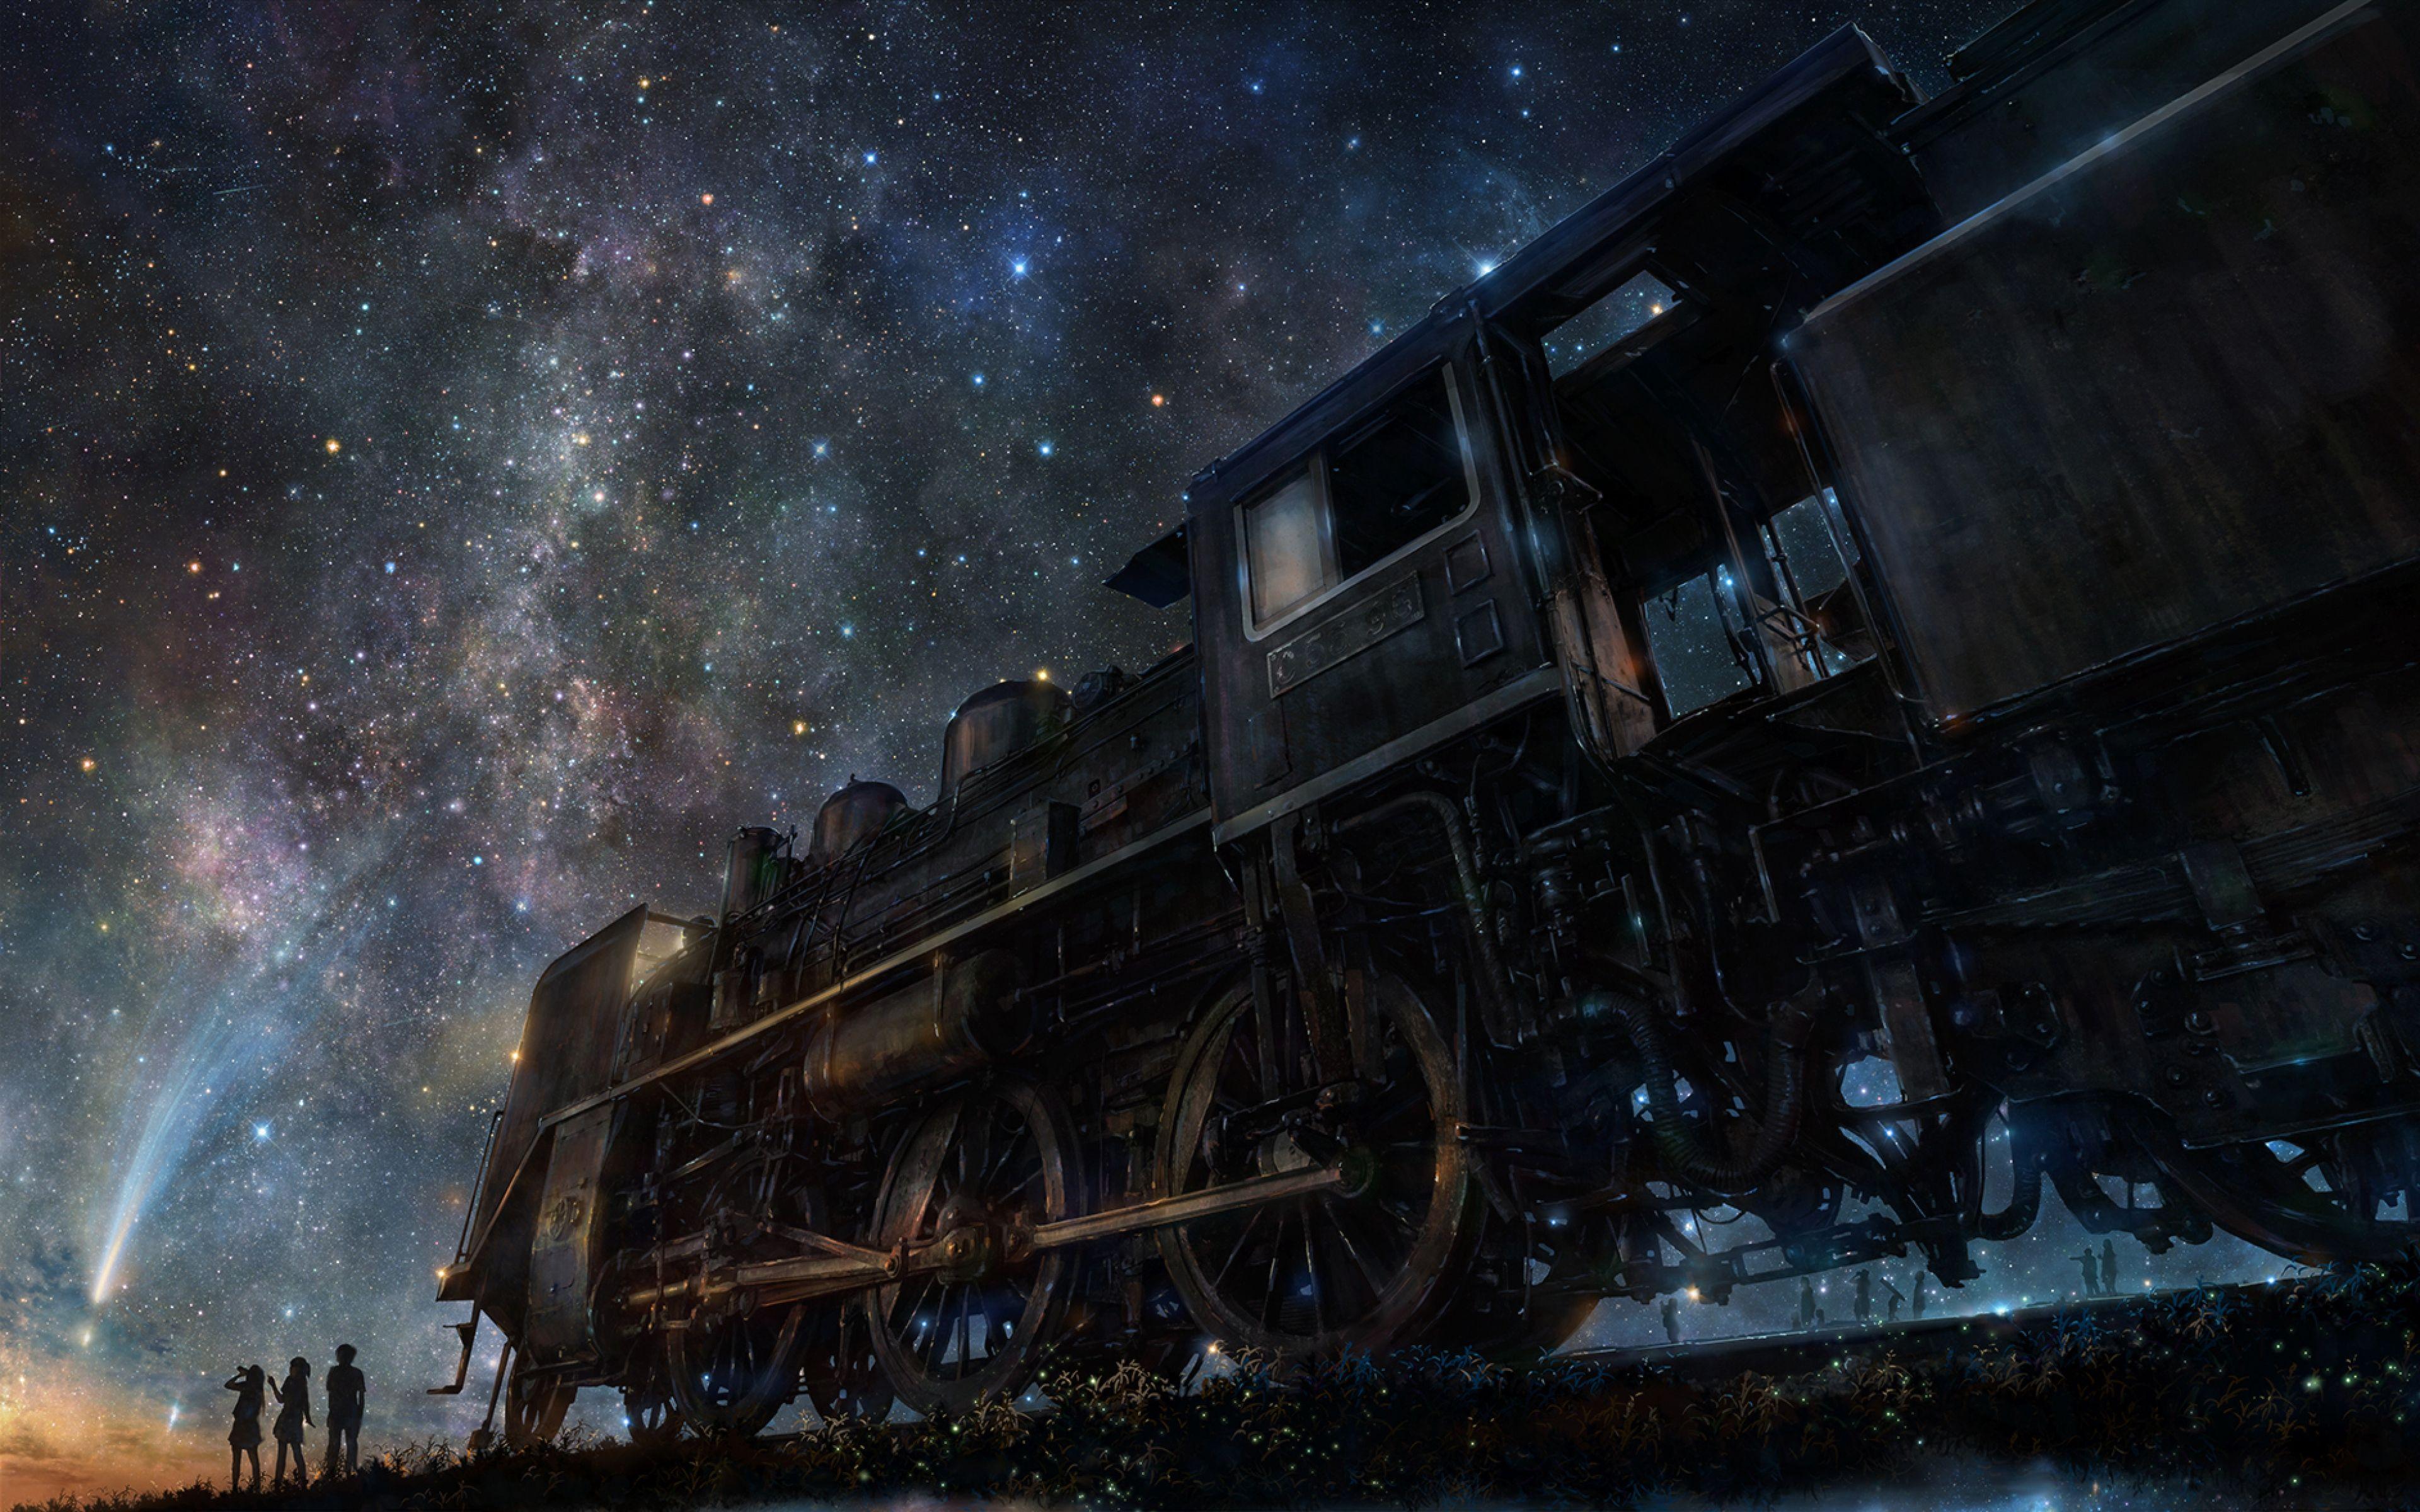 Starry Sky wallpaper x